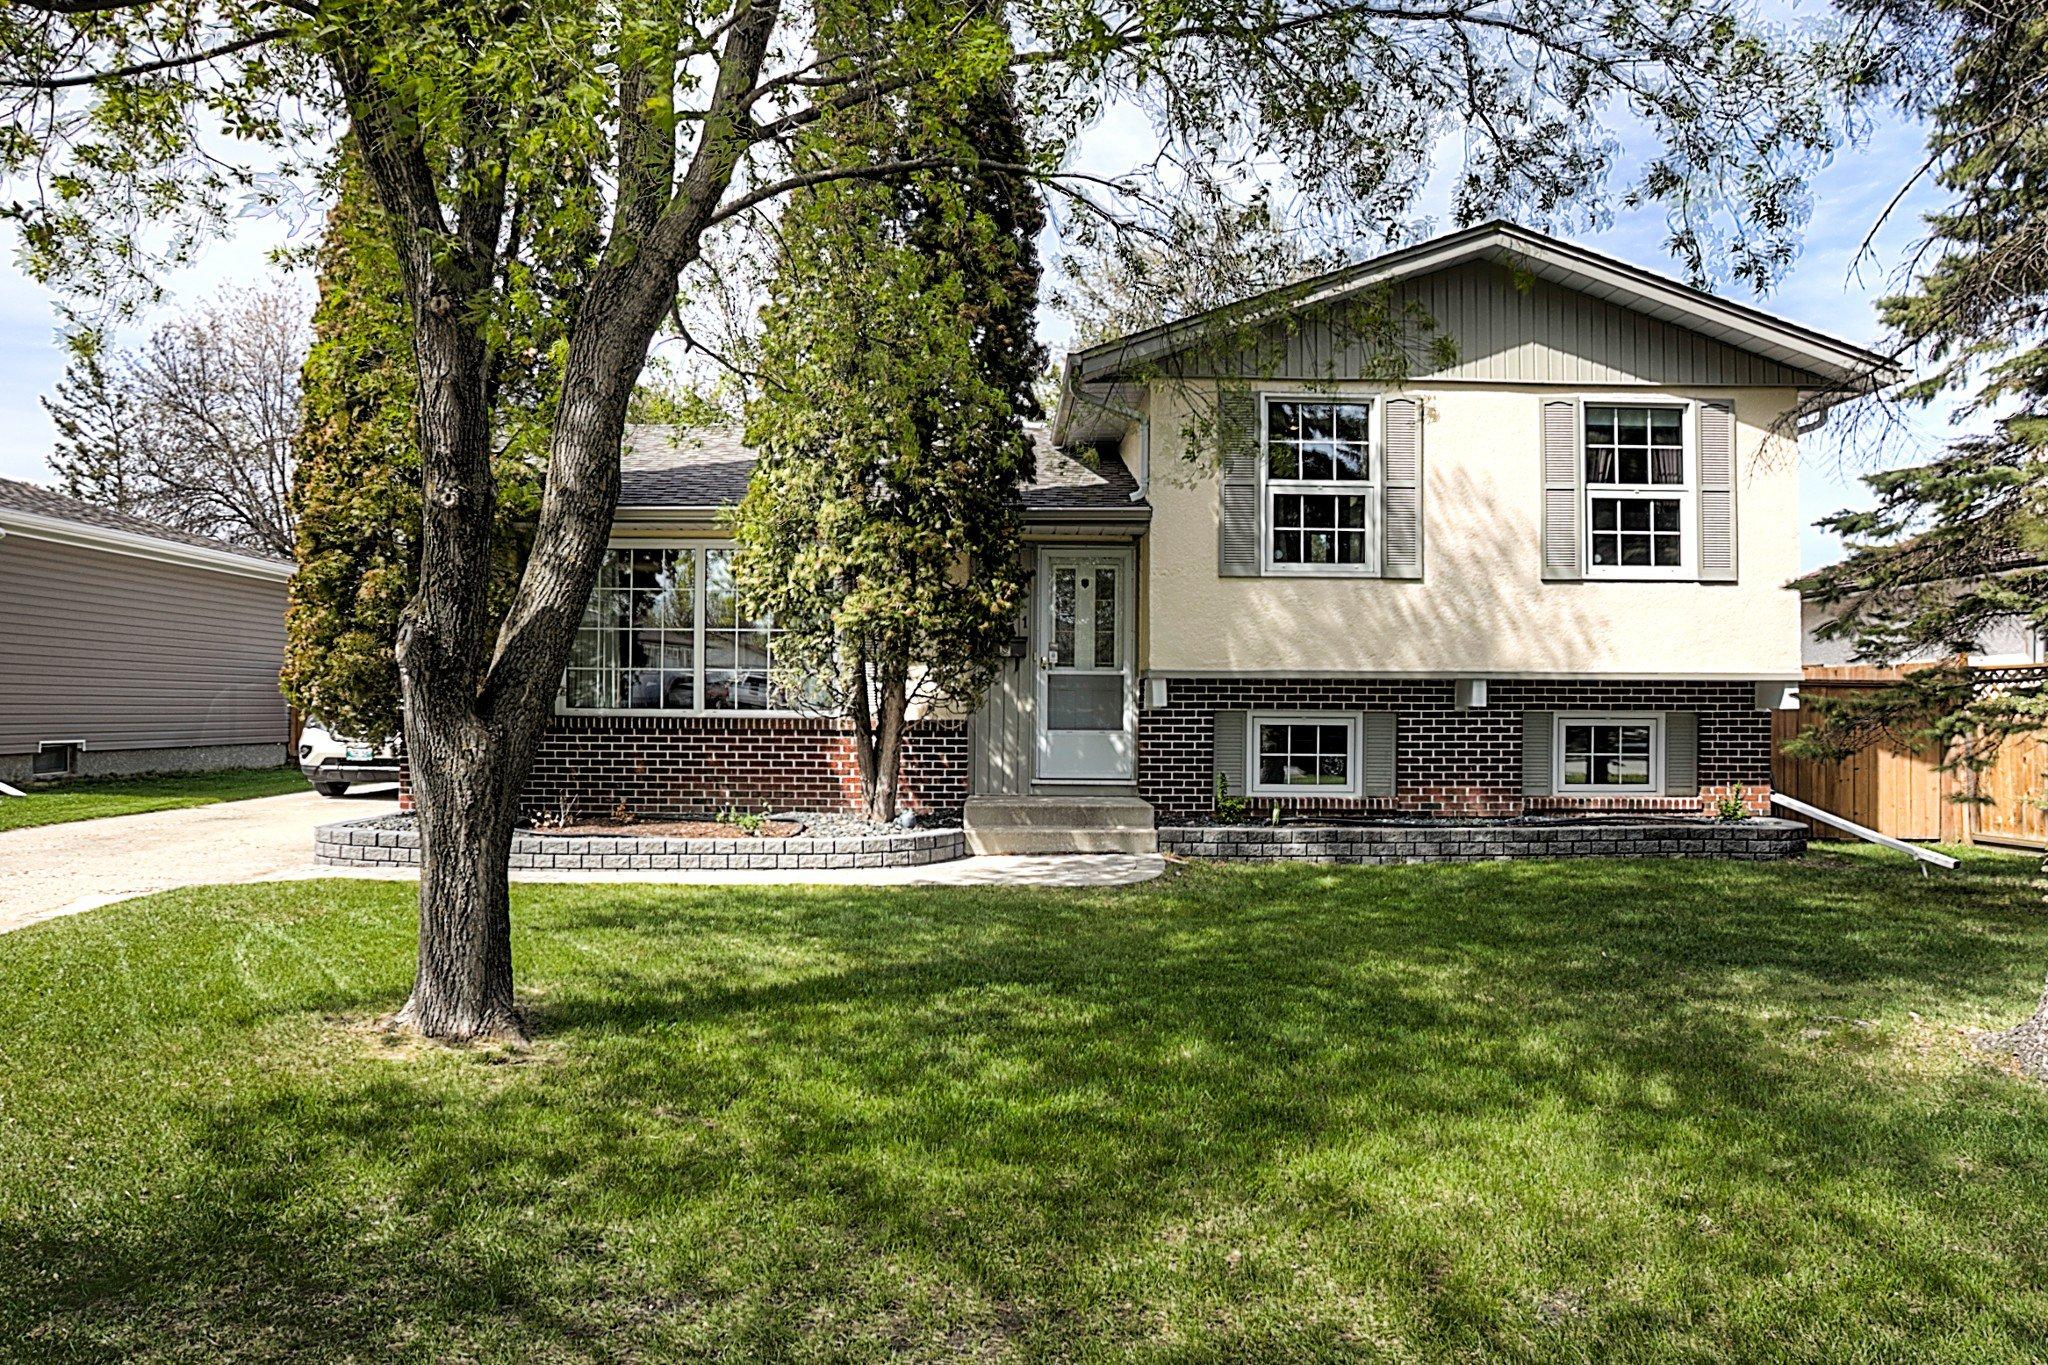 Main Photo: 6551 Rannock Avenue in Winnipeg: Charleswood Single Family Detached for sale (1G)  : MLS®# 1913241